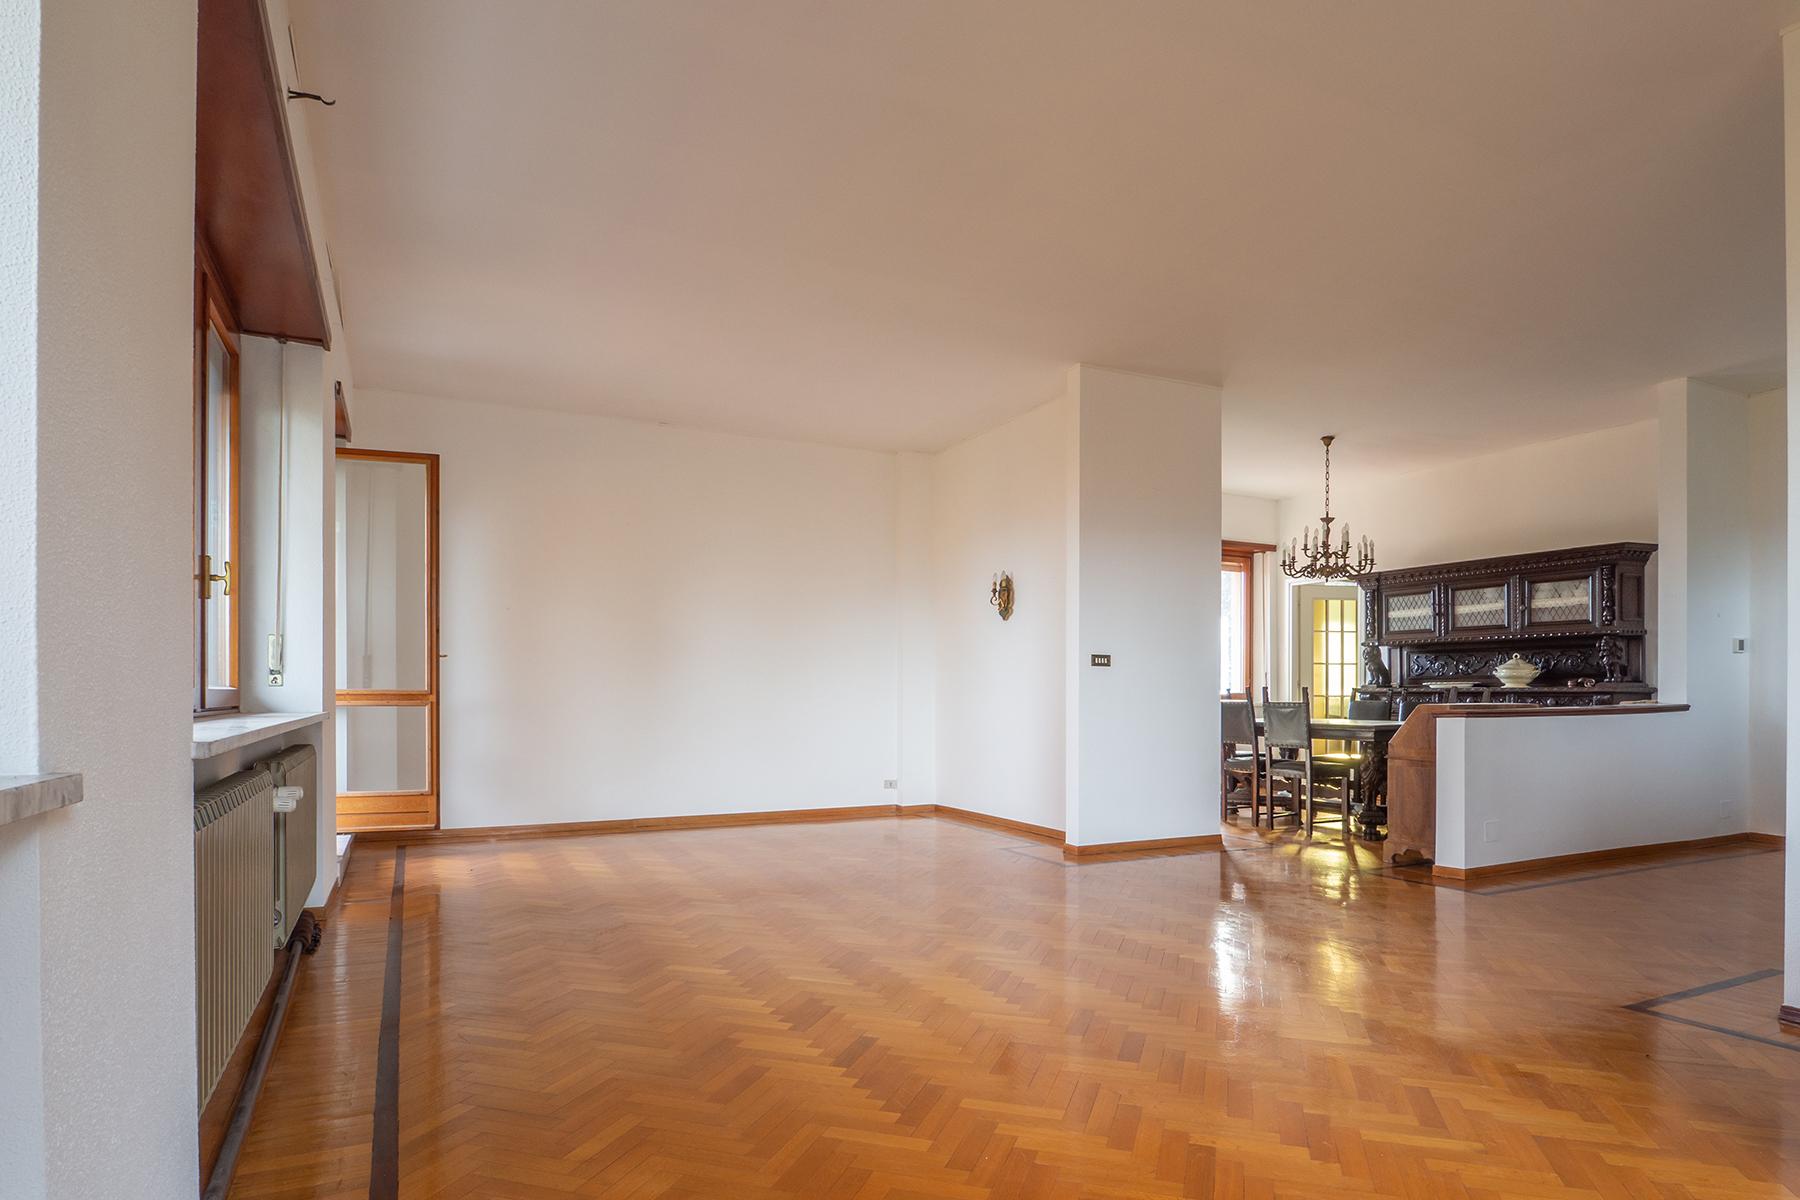 Casa indipendente in Vendita a Torino: 5 locali, 277 mq - Foto 2